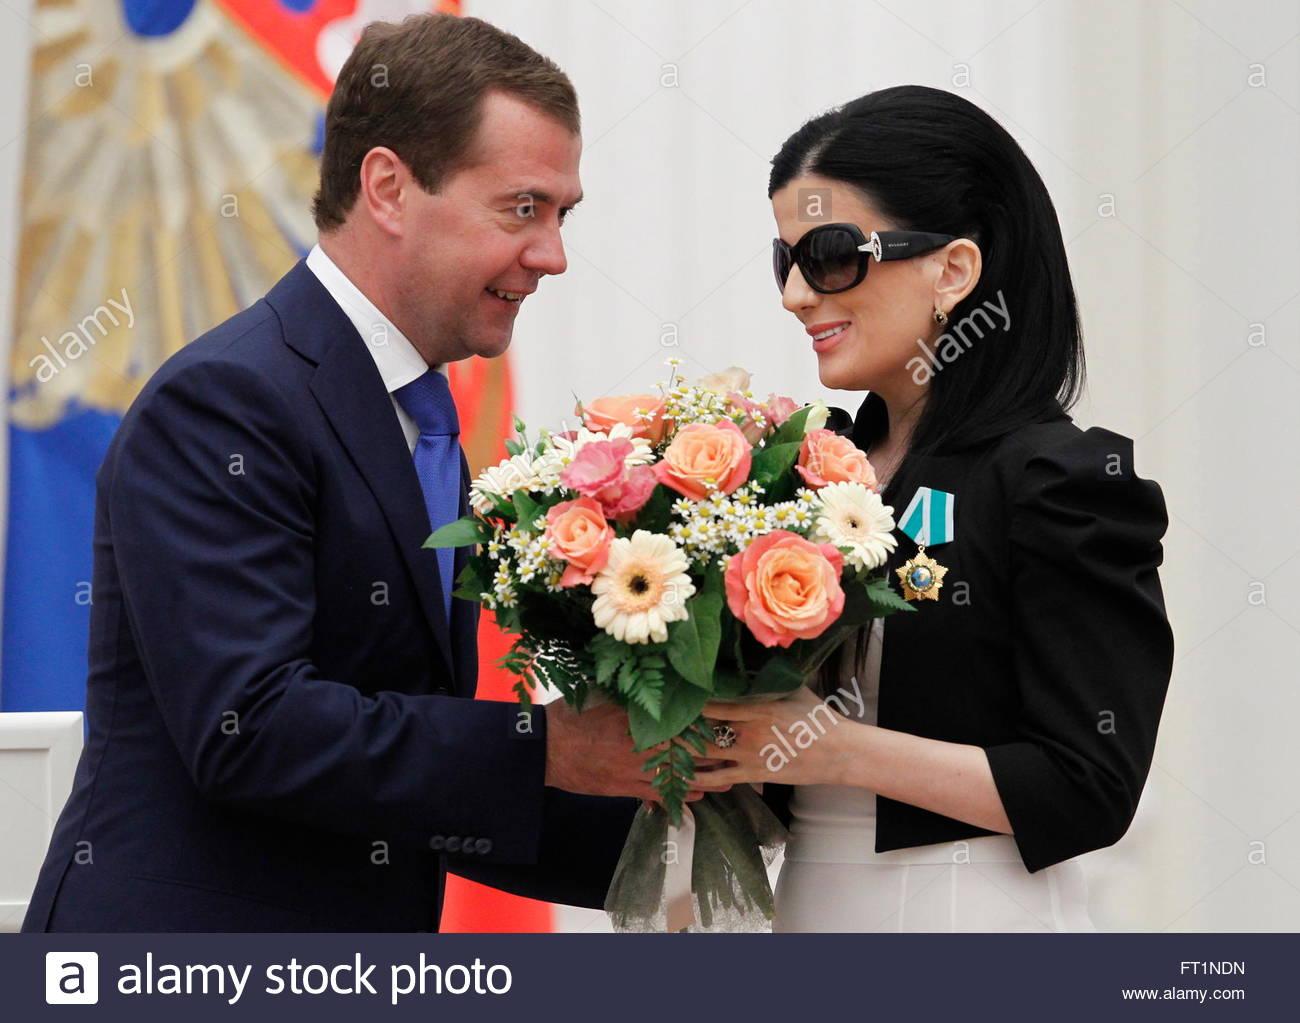 diana NDN Russia's President Dmitry Medvedev (L) presents flowers to Russian singer Diana Gurtskaya after awarding